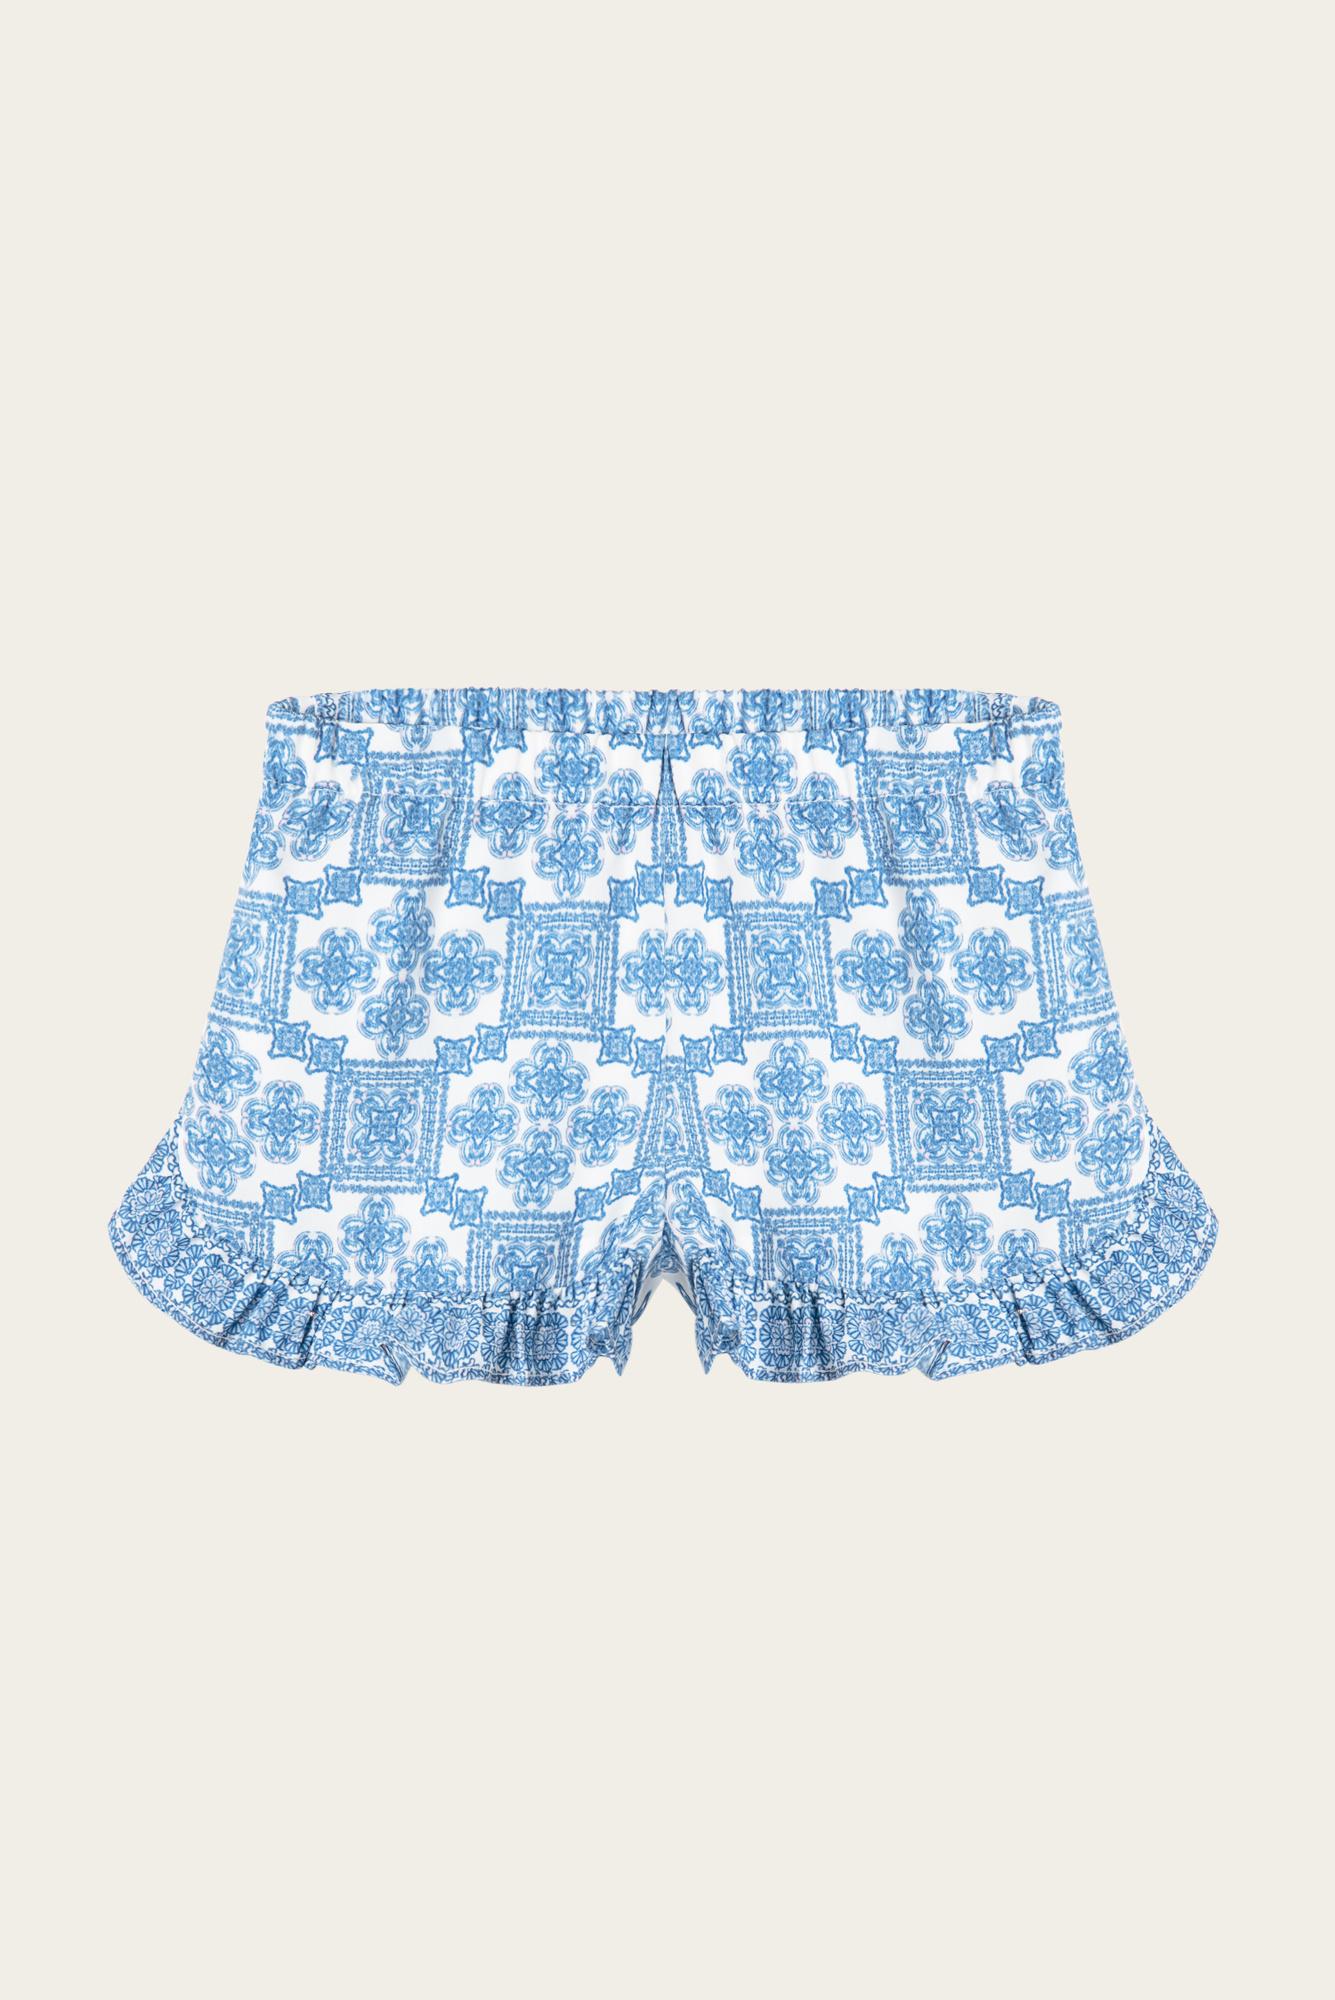 1159_5eeb736bd2-mini-leona-shorts-ocean-breeze-by-malina-1-big.jpg